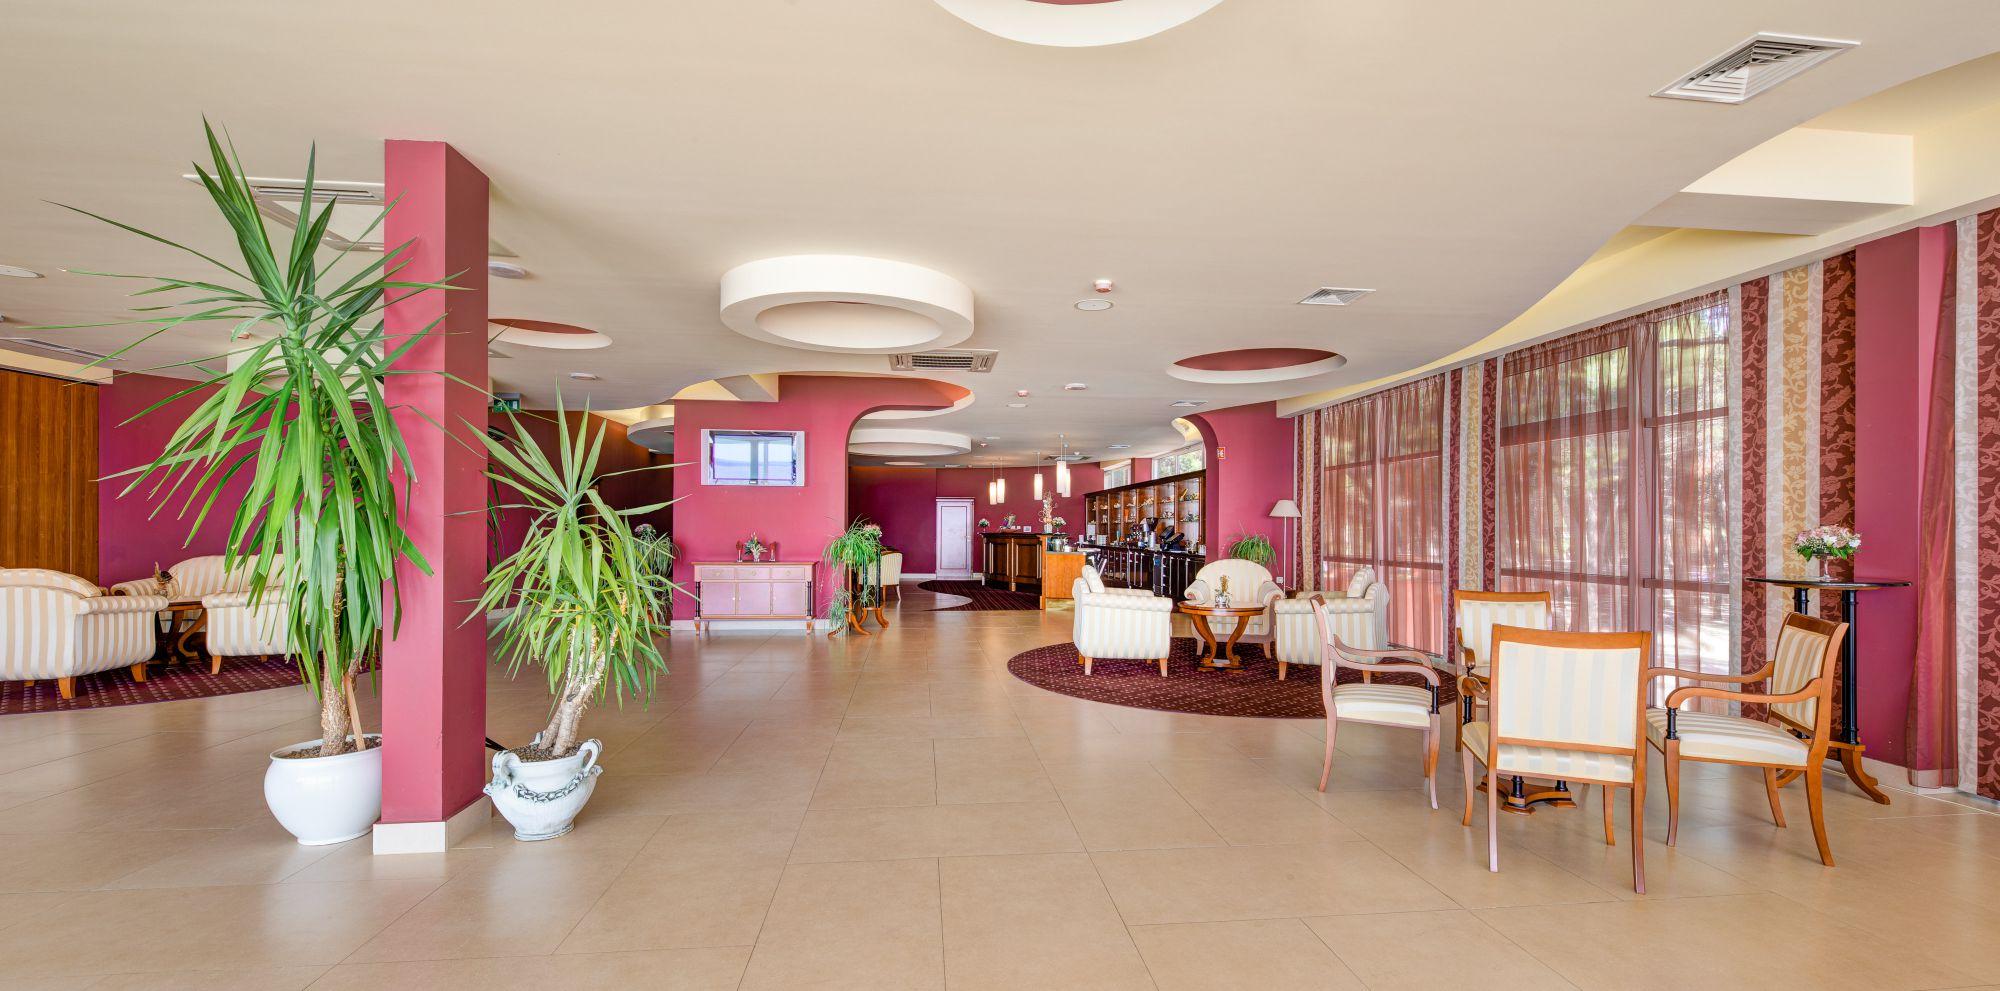 congress center lobby bar 01 14826123065 o - Zora Hotel